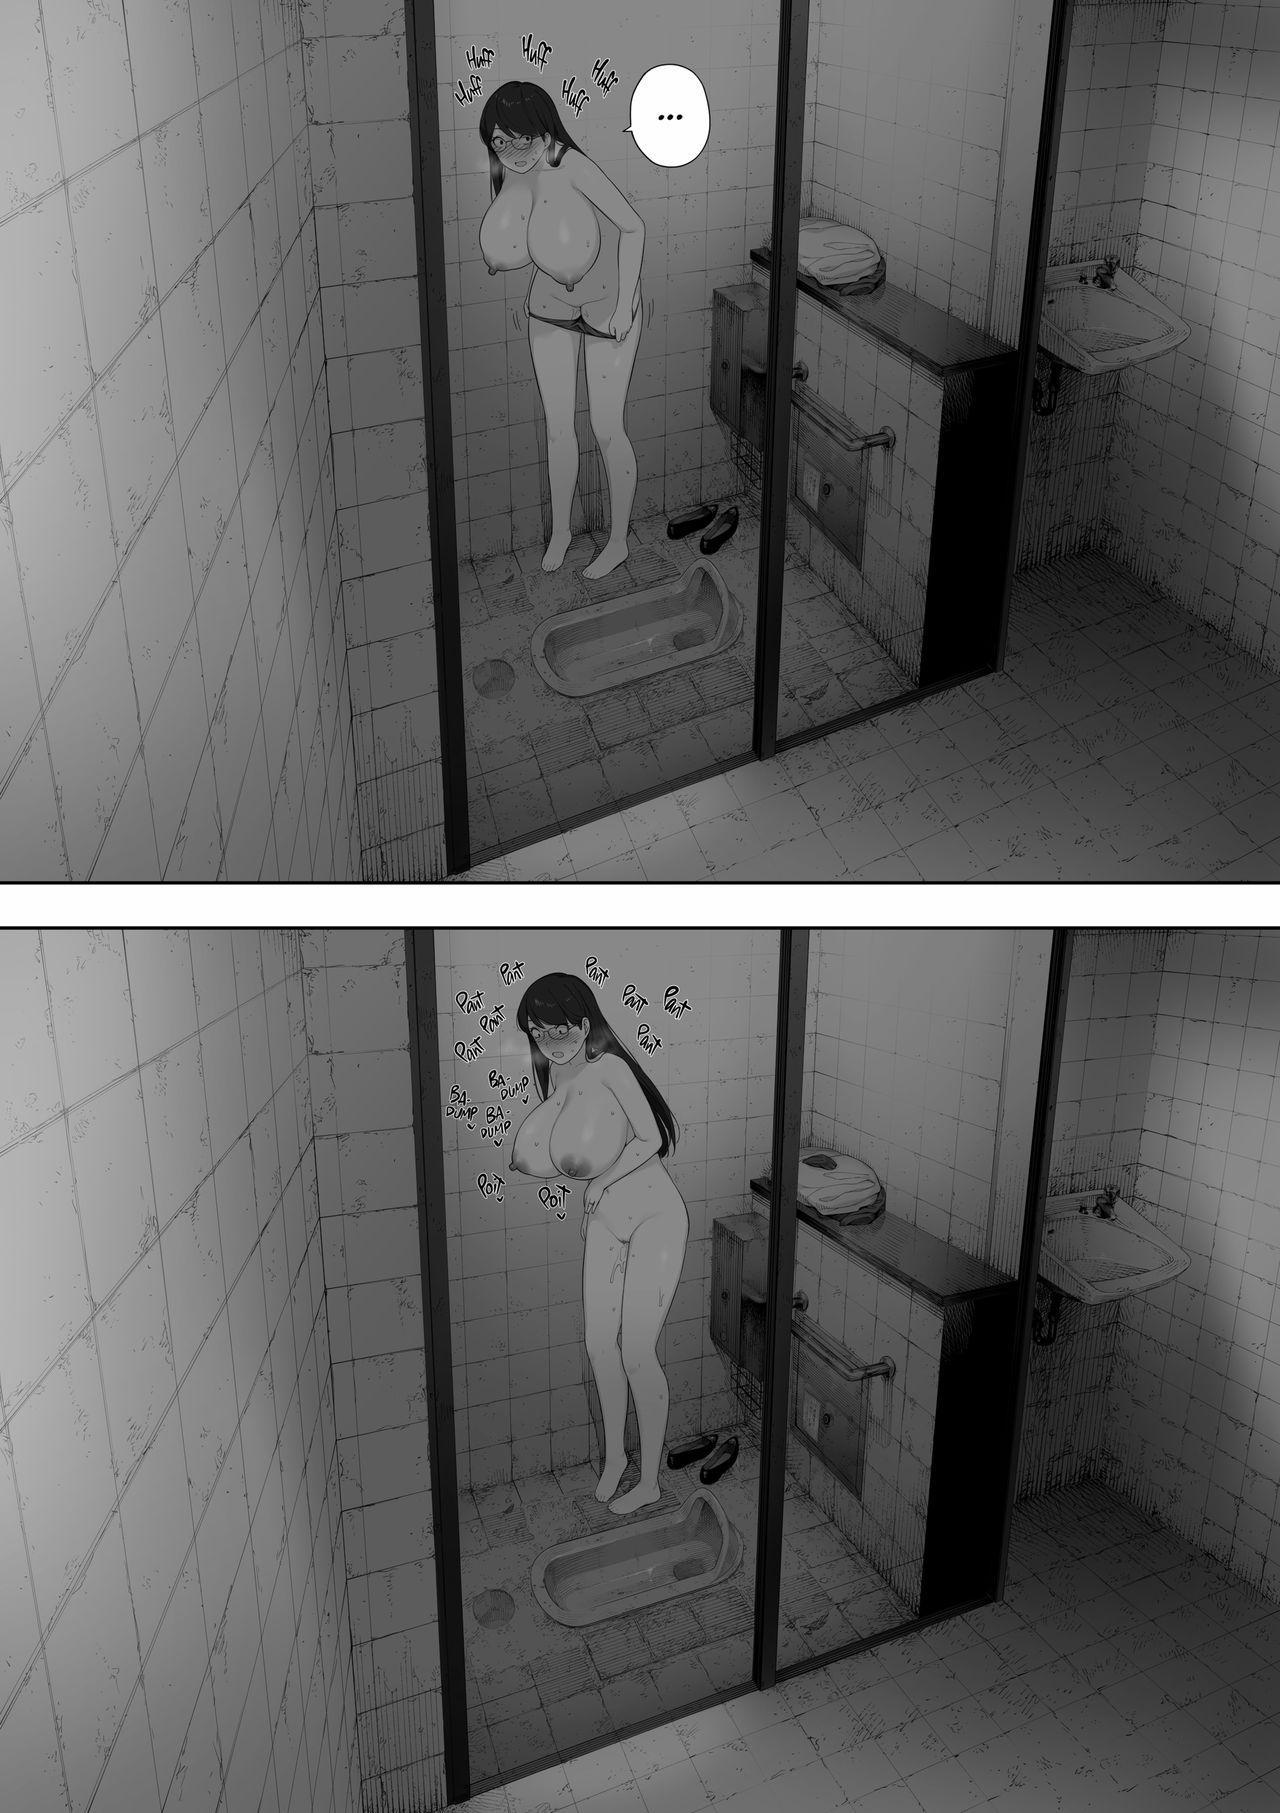 [NT Labo (NT Robo)] Aisai, Doui no Ue, Netorare Roshutsu | [NT Labo(NT Robo)] Cucked With_My Consent My Exhibitionist Wife [English] 42